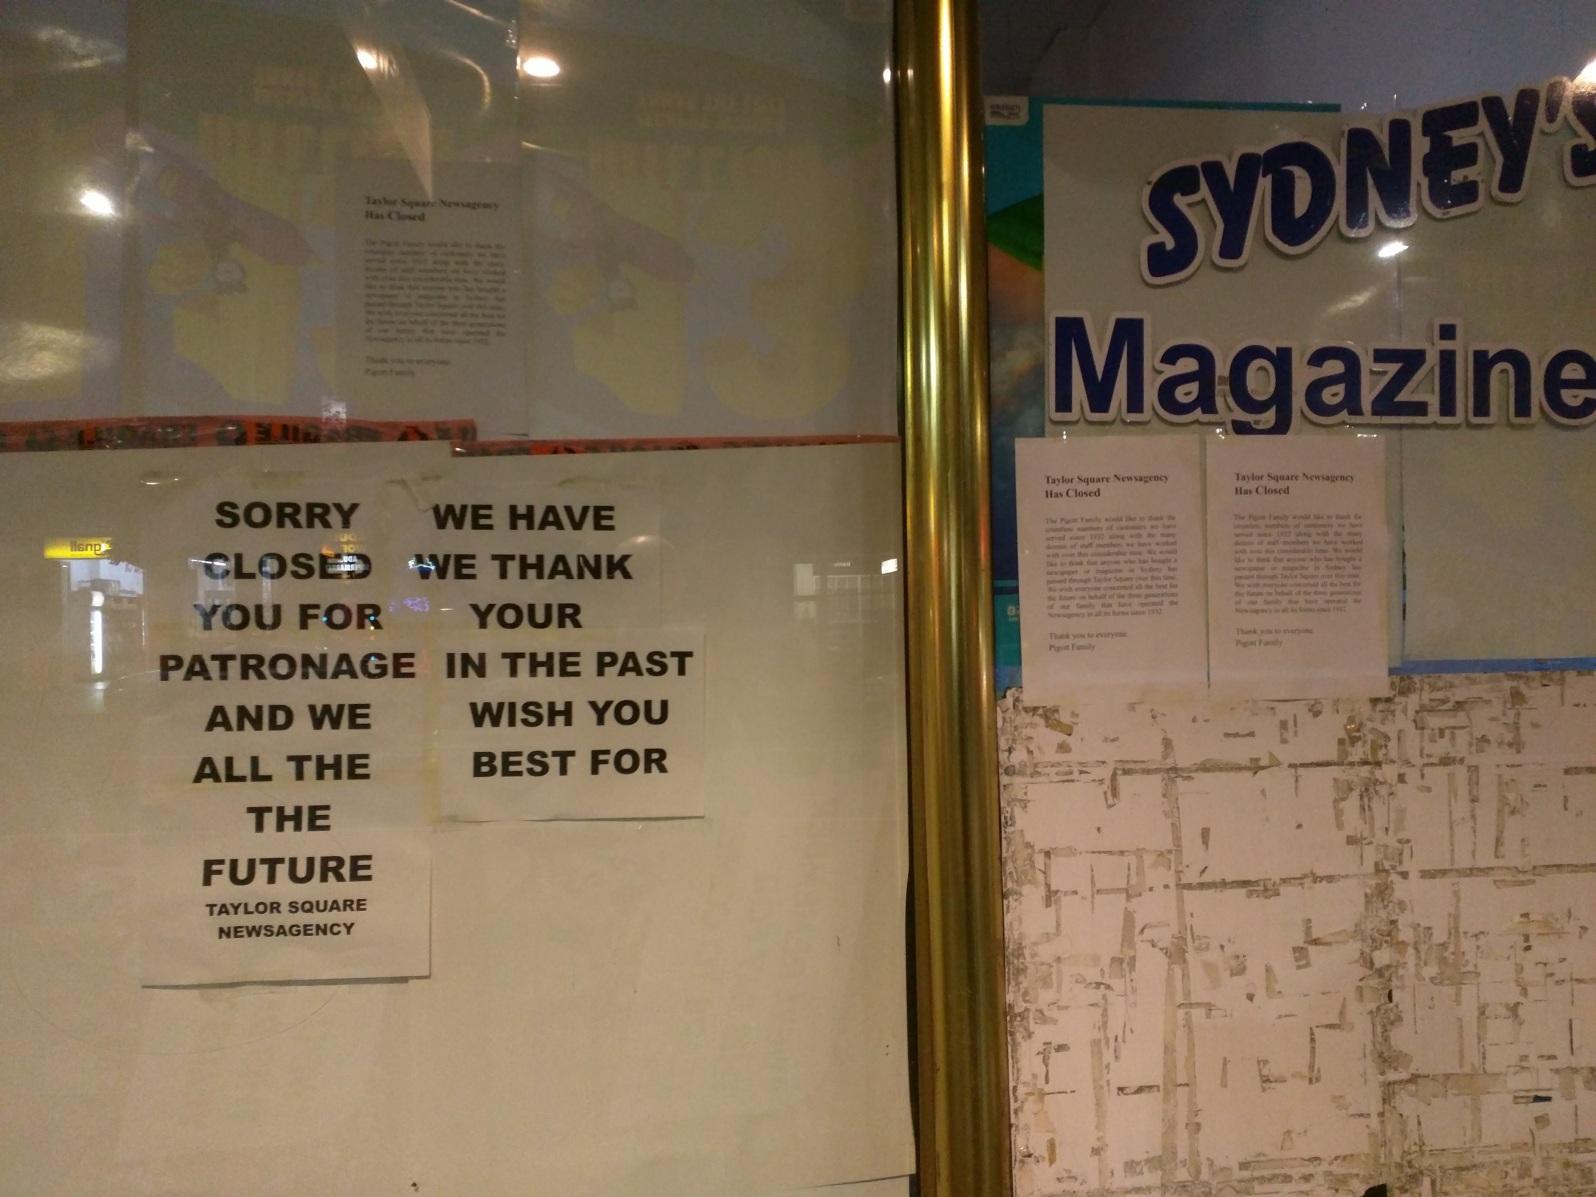 Taylor Square Newsagency